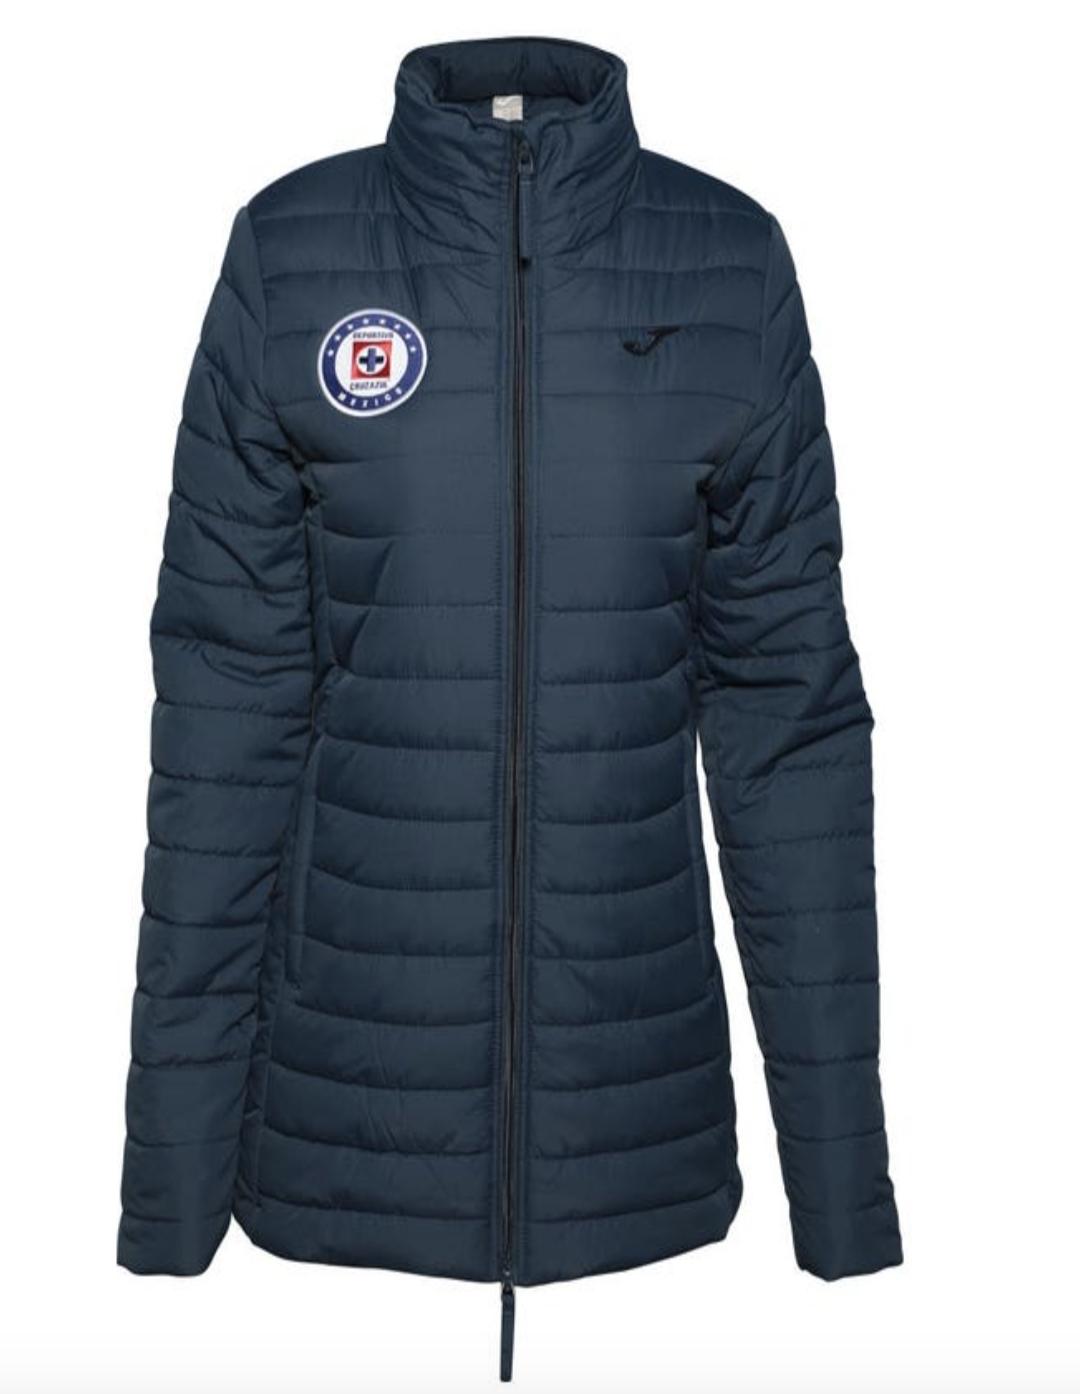 Official Cruz Azul Women's Winter Jacket (Authentic)